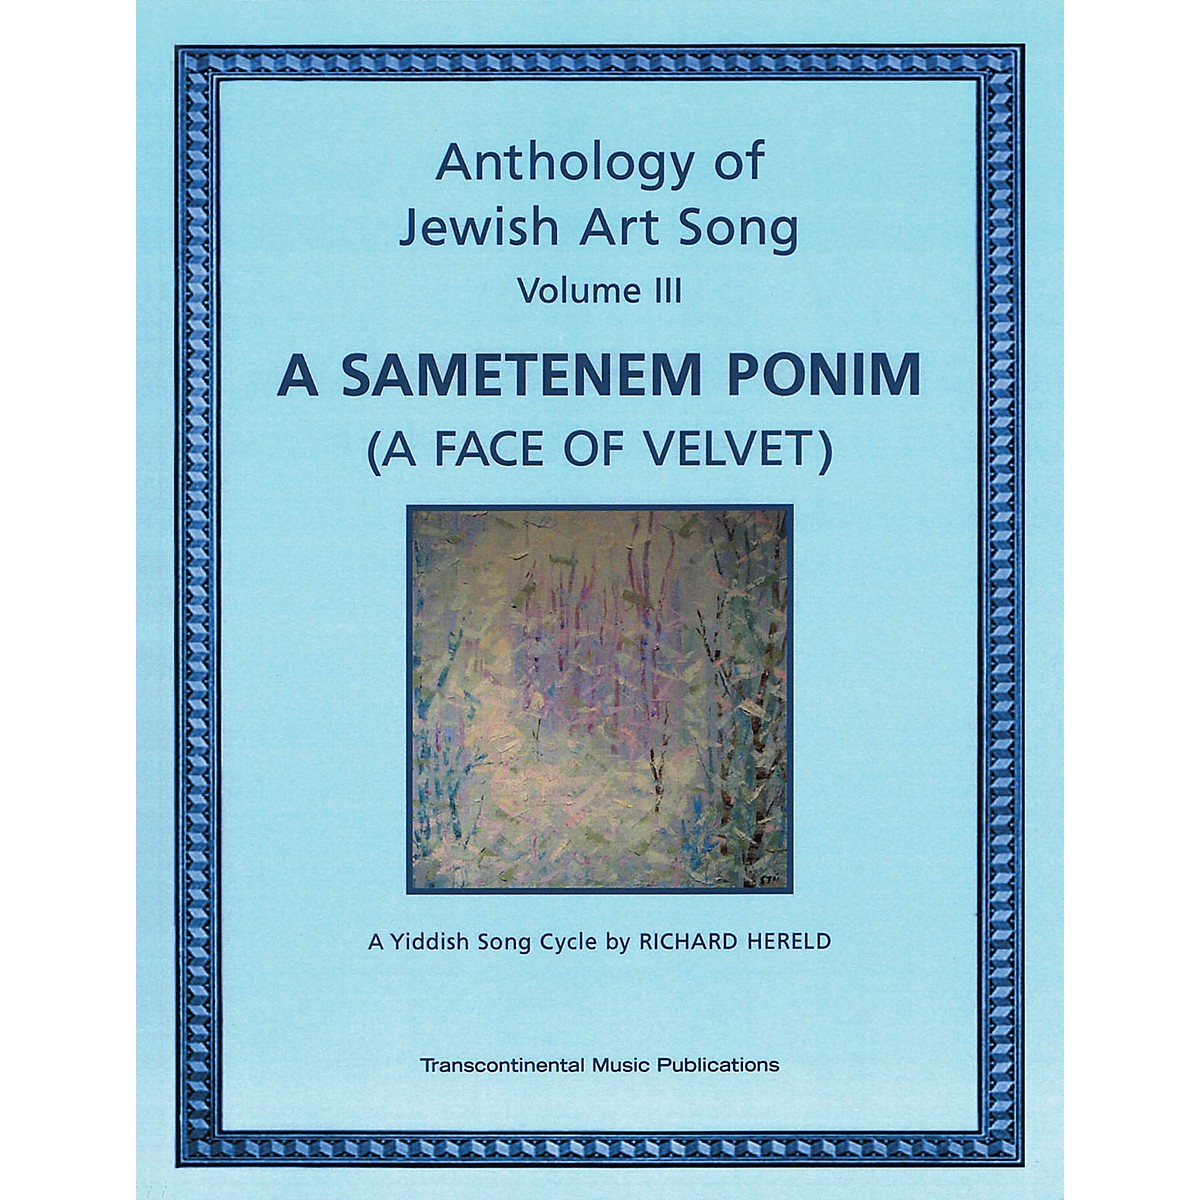 Transcontinental Music Anthology of Jewish Art Song, Vol. 3: A Sametenem Ponim (A Face of Velvet) Transcontinental Music by Hereld